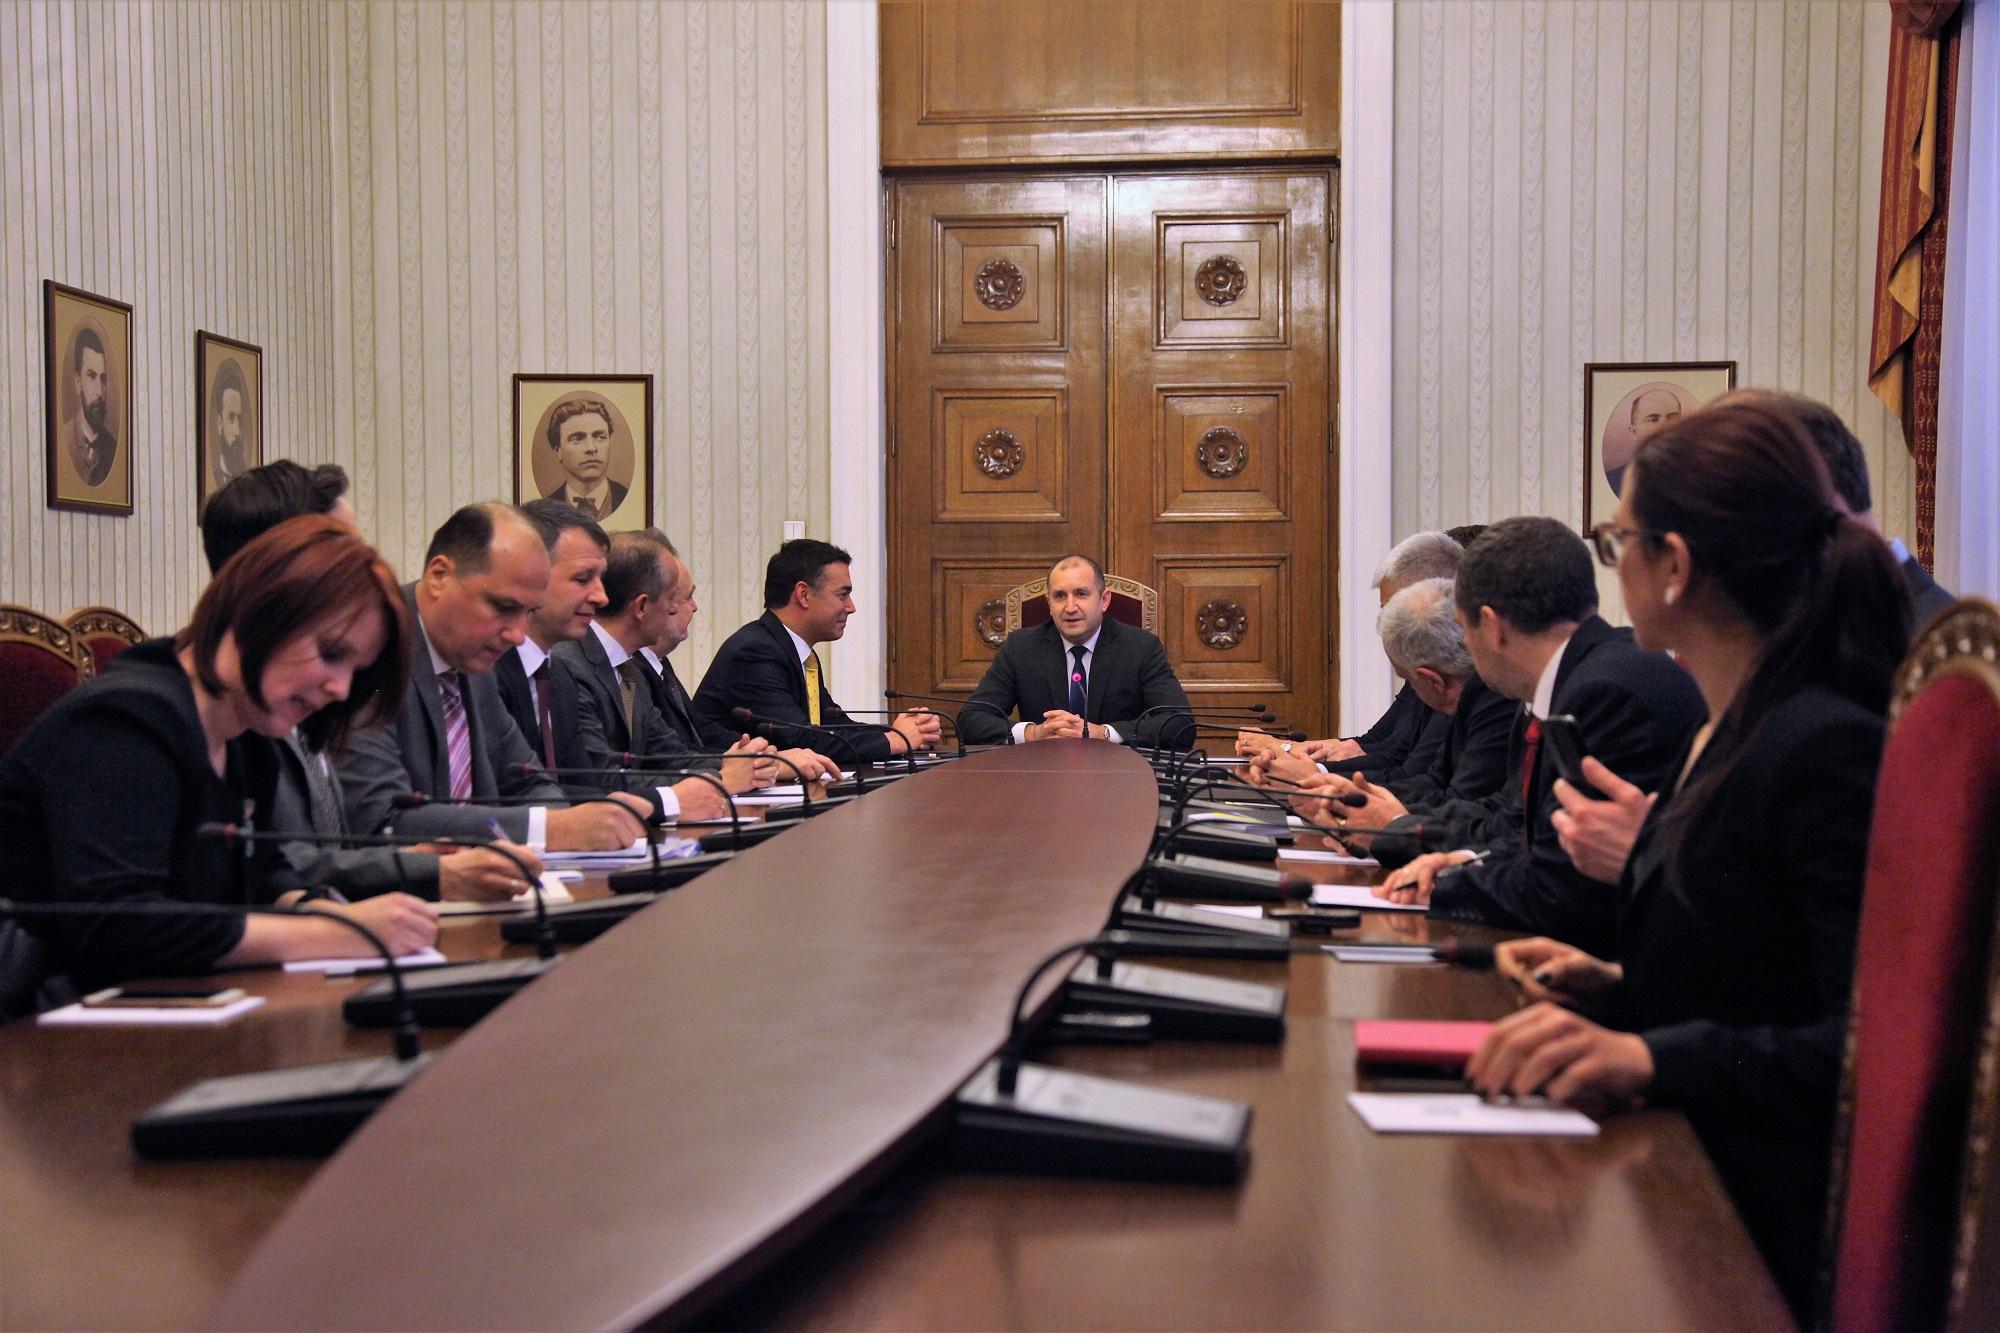 Димитров се сретна со Радев   Борисов и Захариева